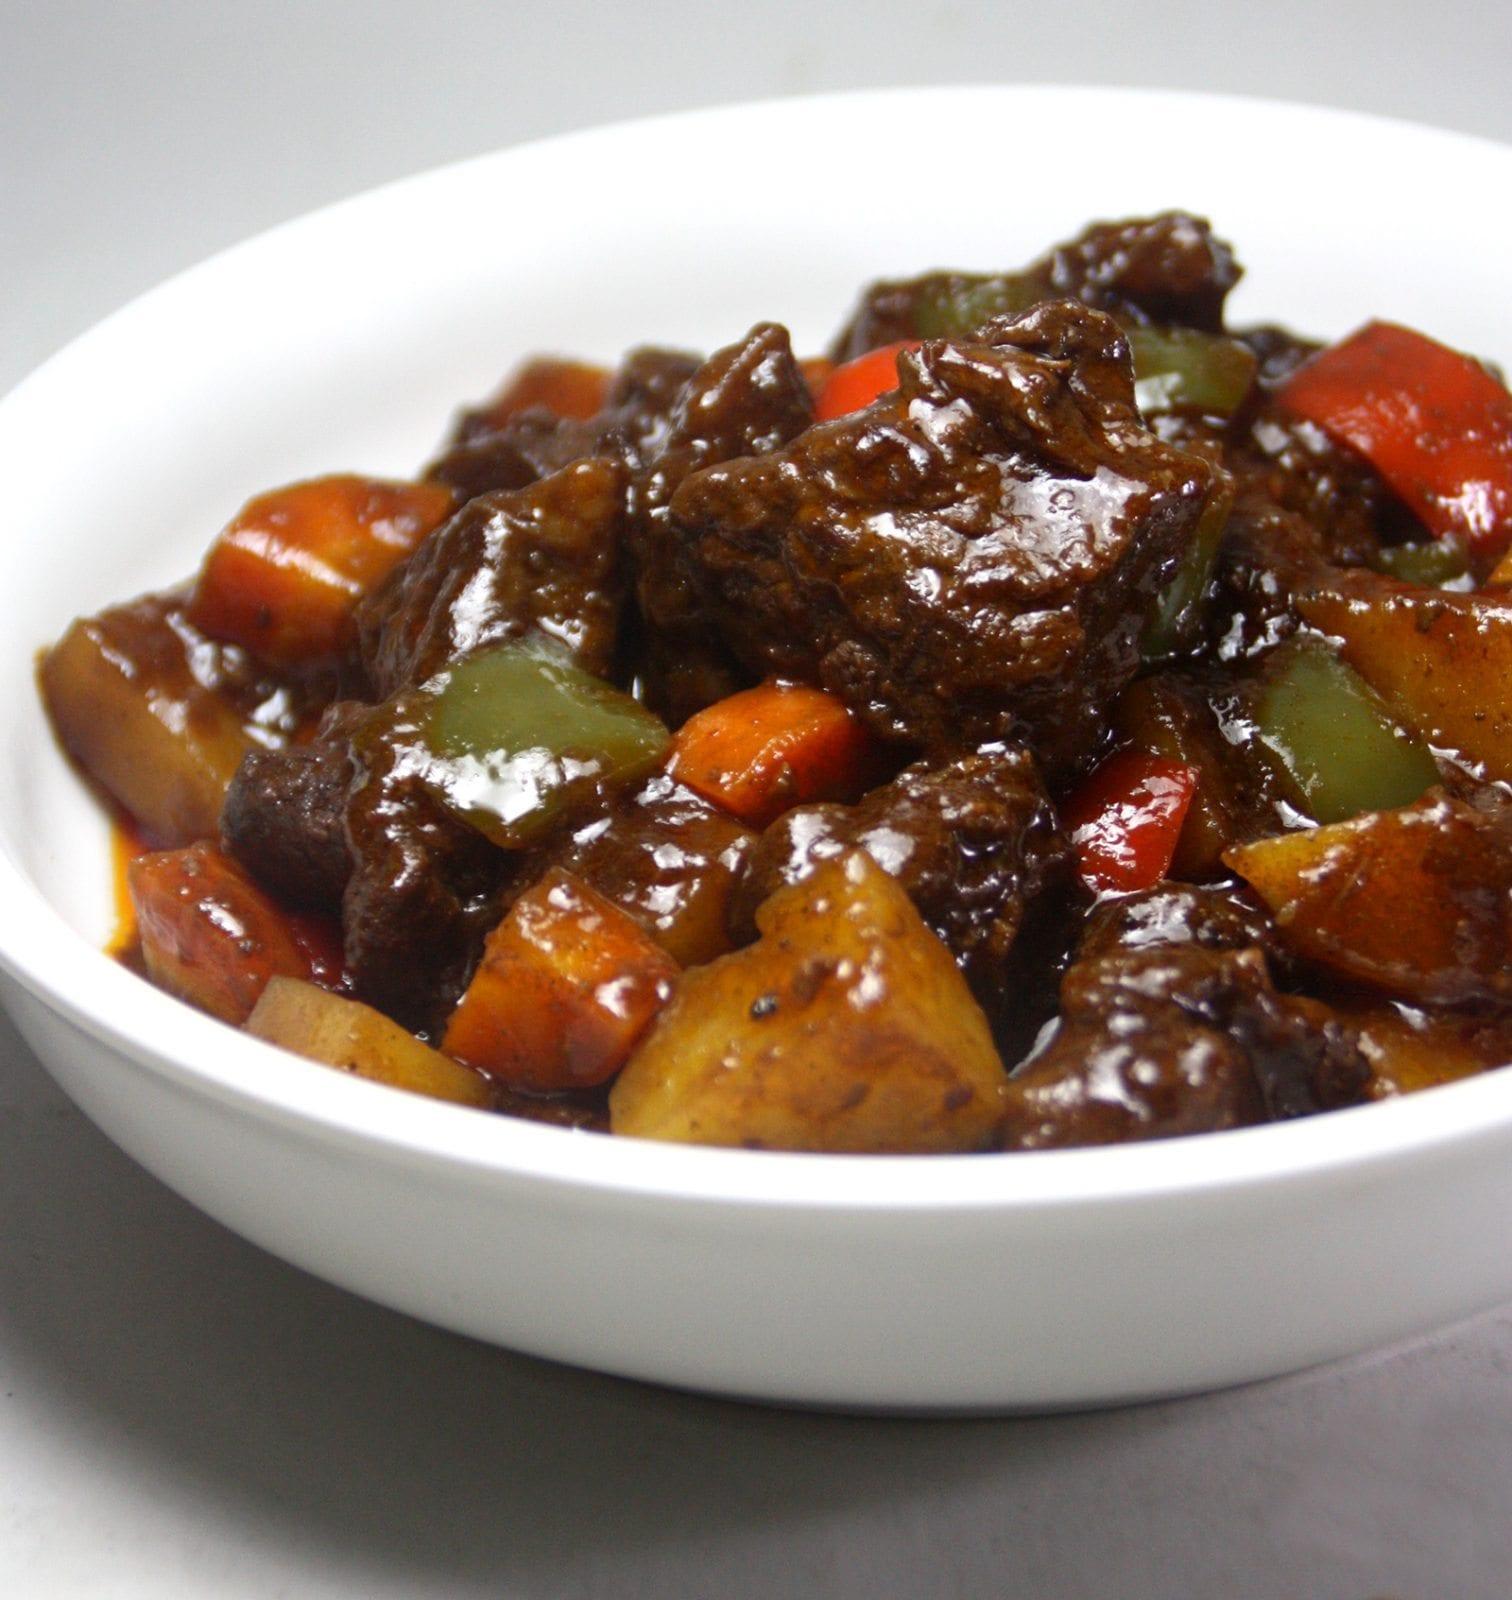 Filiipino Food in Seoul beefcaldereta tasteandco ph